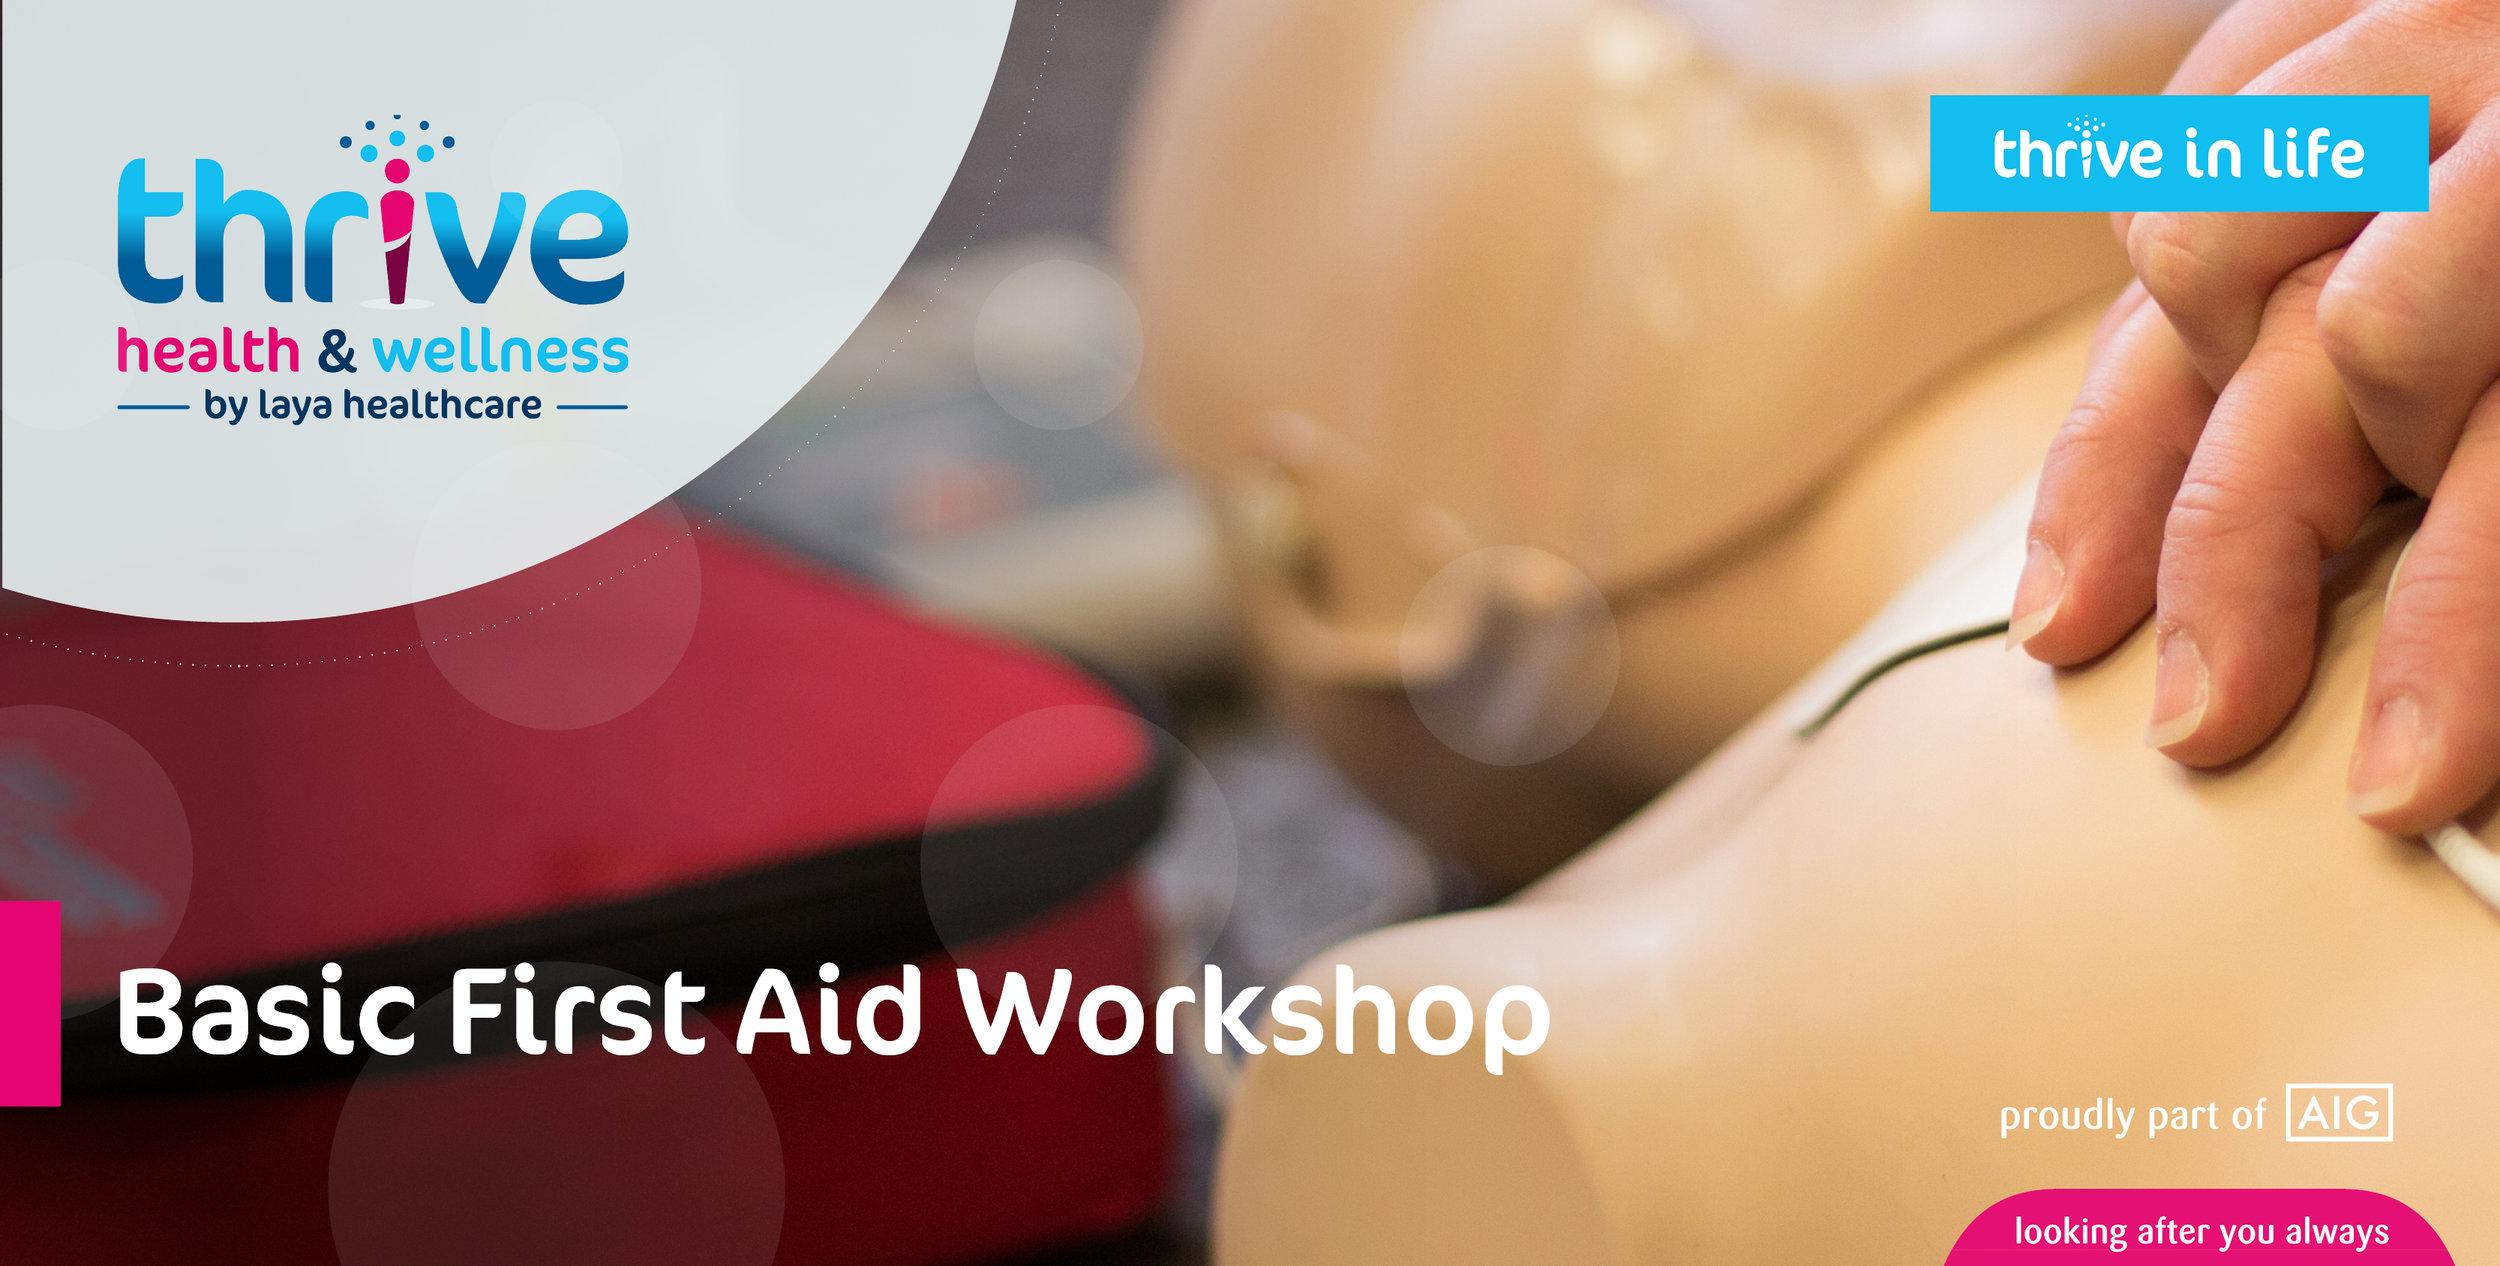 MAILCHIMP TEMPLATE.  Basic First Aid Training Workshop.jpg